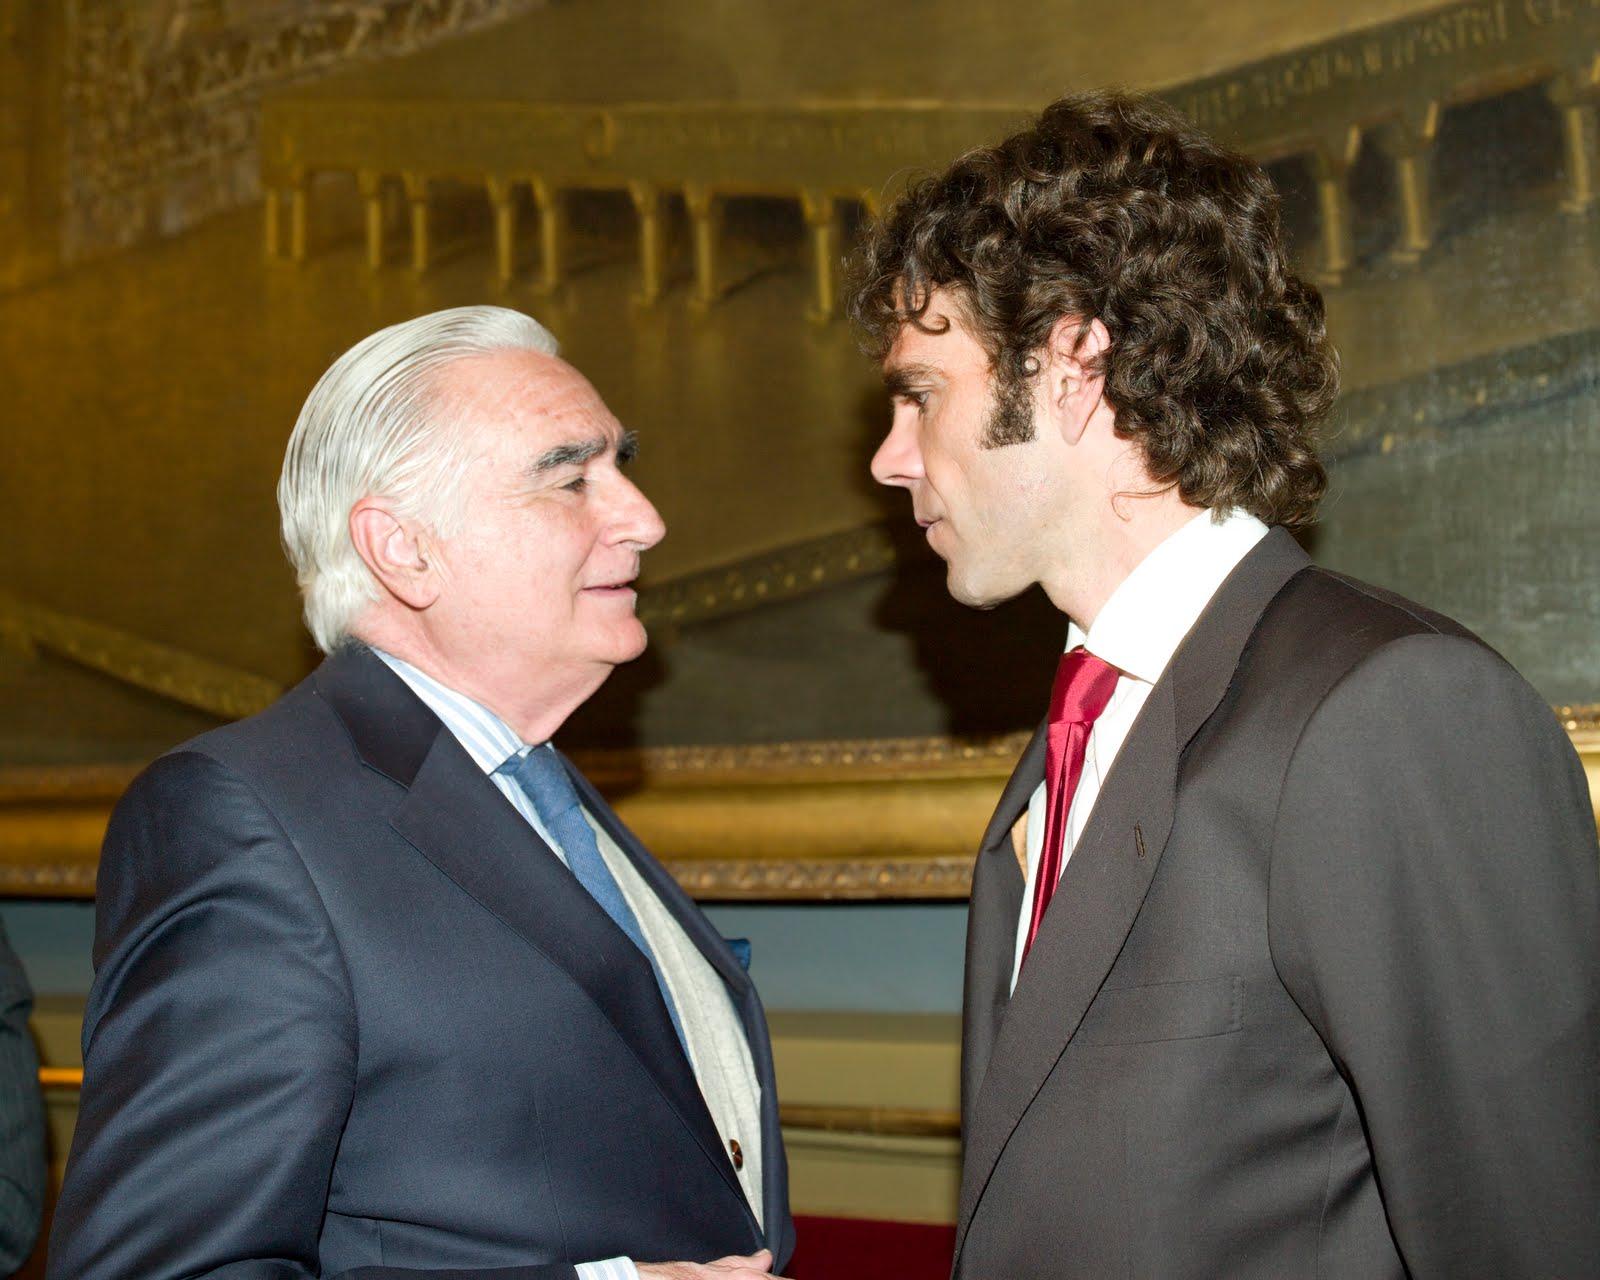 Asociacion taurina parlamentaria atp d manuel delgado - Hermanos herrero ...